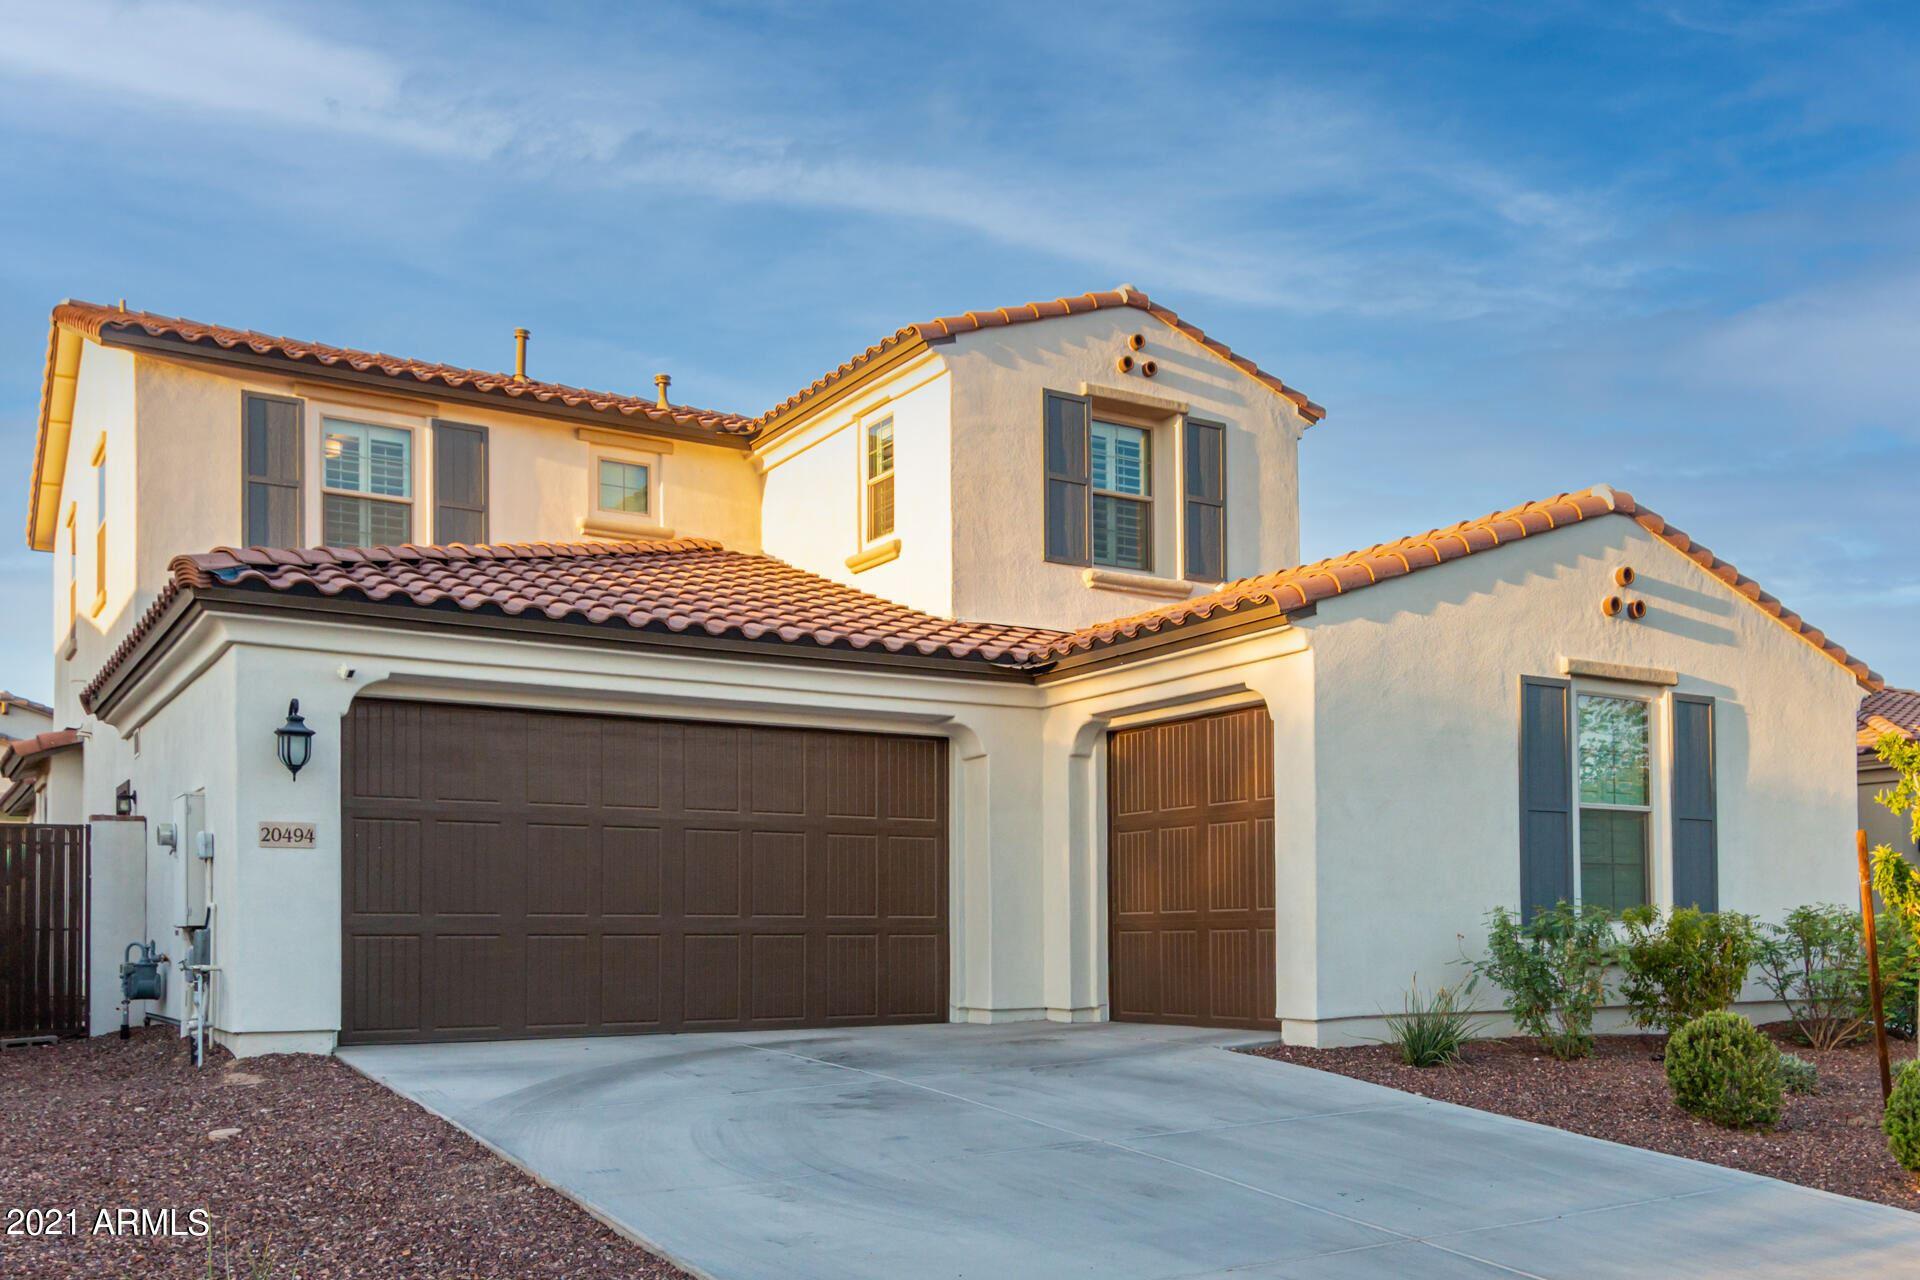 20494 W DELANEY Drive, Buckeye, AZ 85396 - MLS#: 6297581